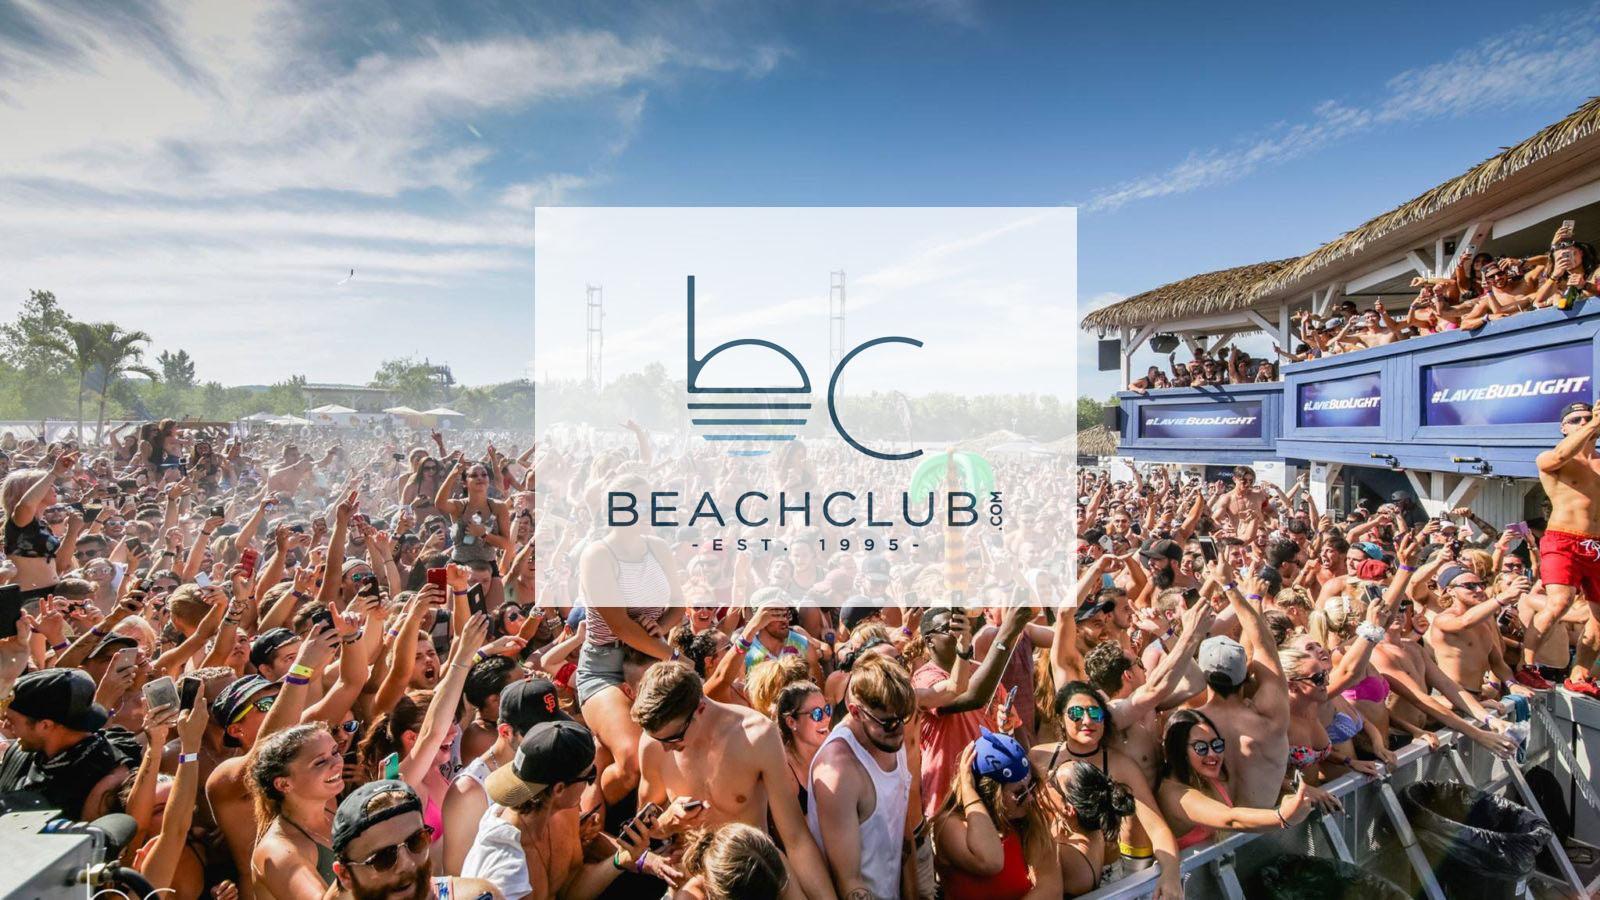 Tes accès au Beachclub